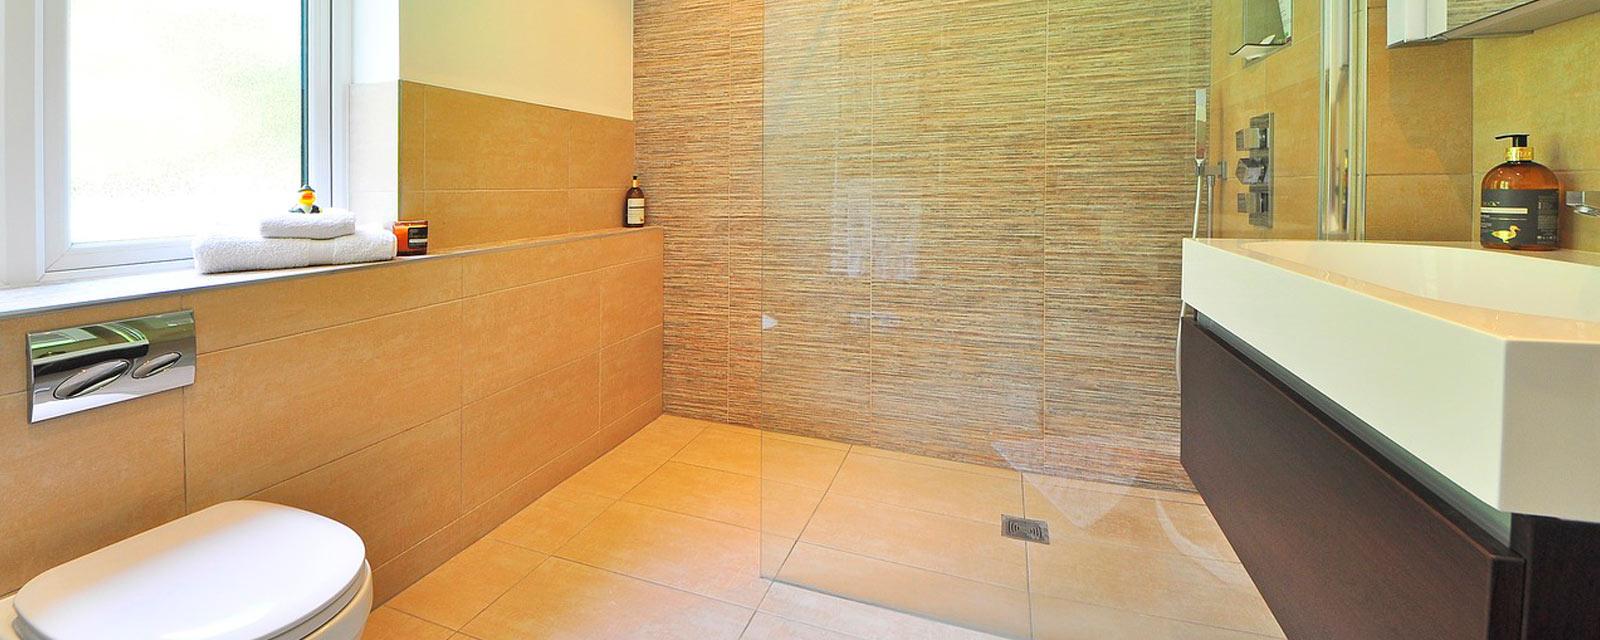 Une salle de bains cologique et conomique guide artisan - Artisan salle de bain ...